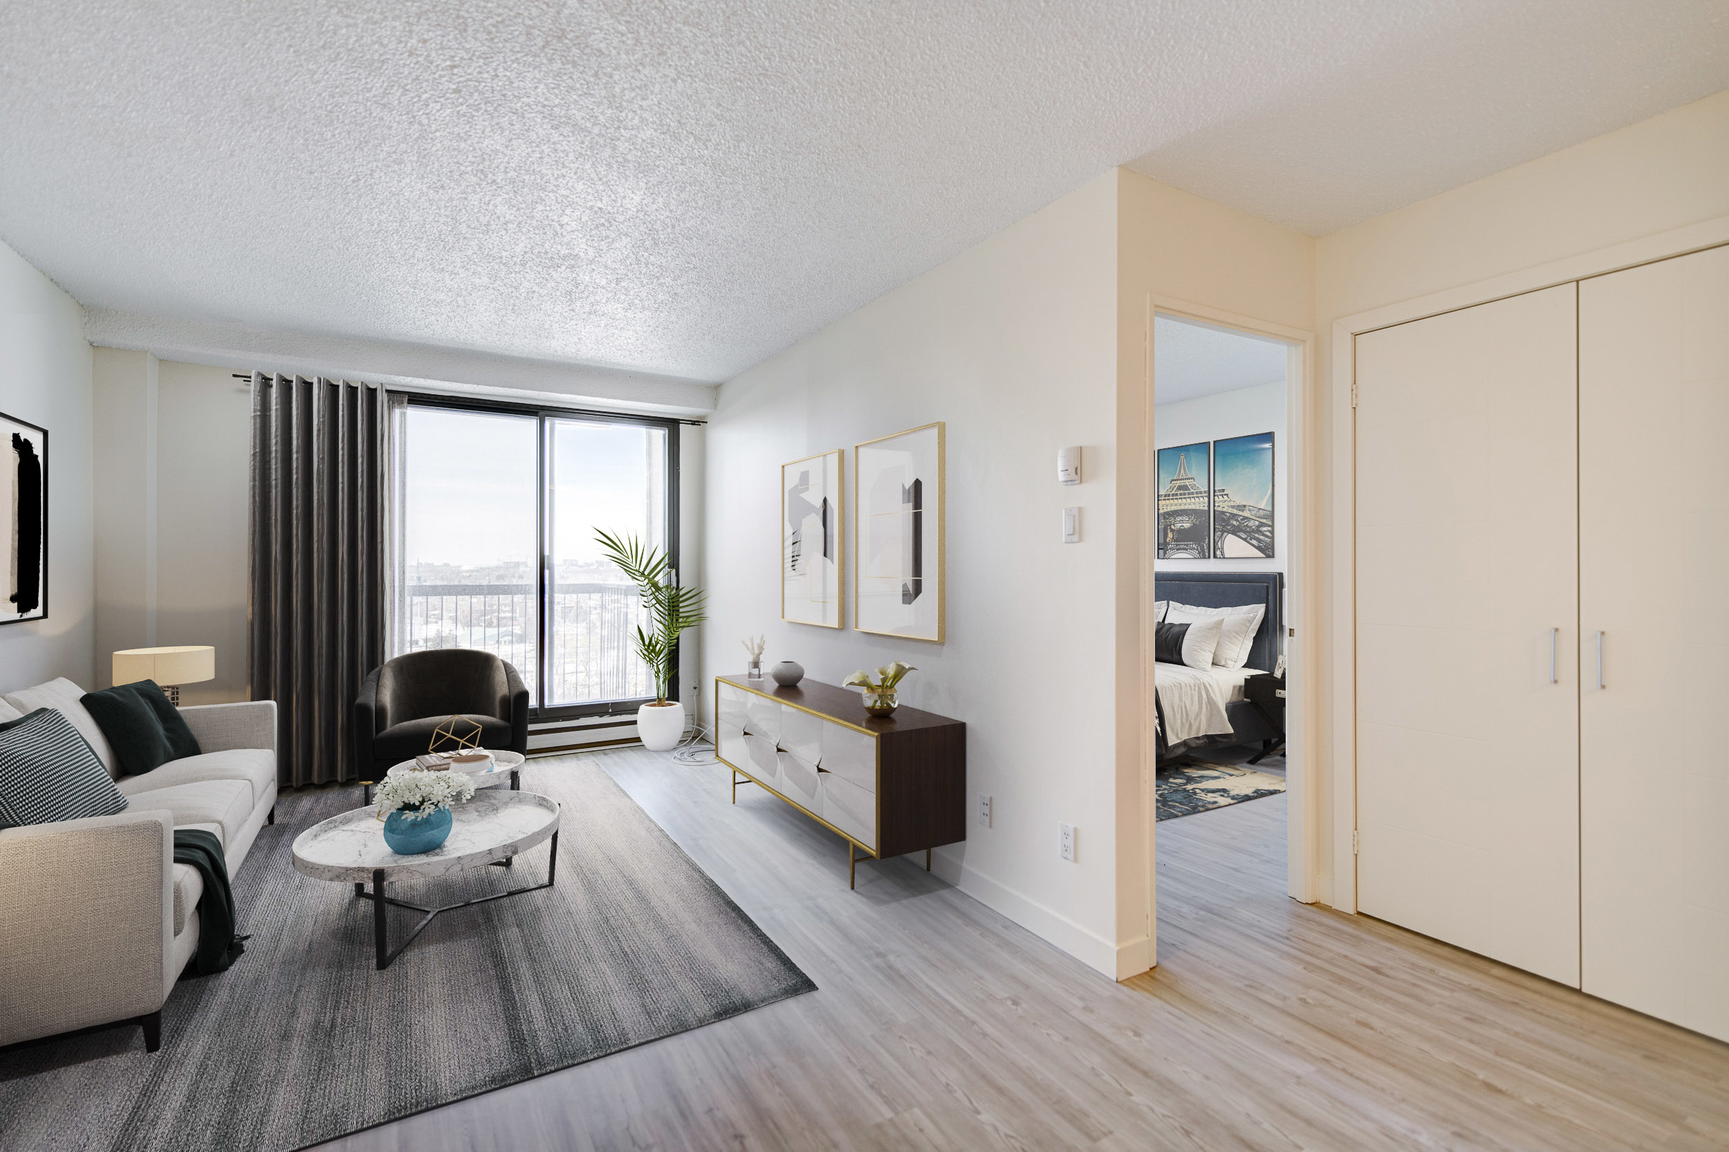 1 bedroom Apartments for rent in Laval at Le Quatre Cent - Photo 02 - RentersPages – L407184